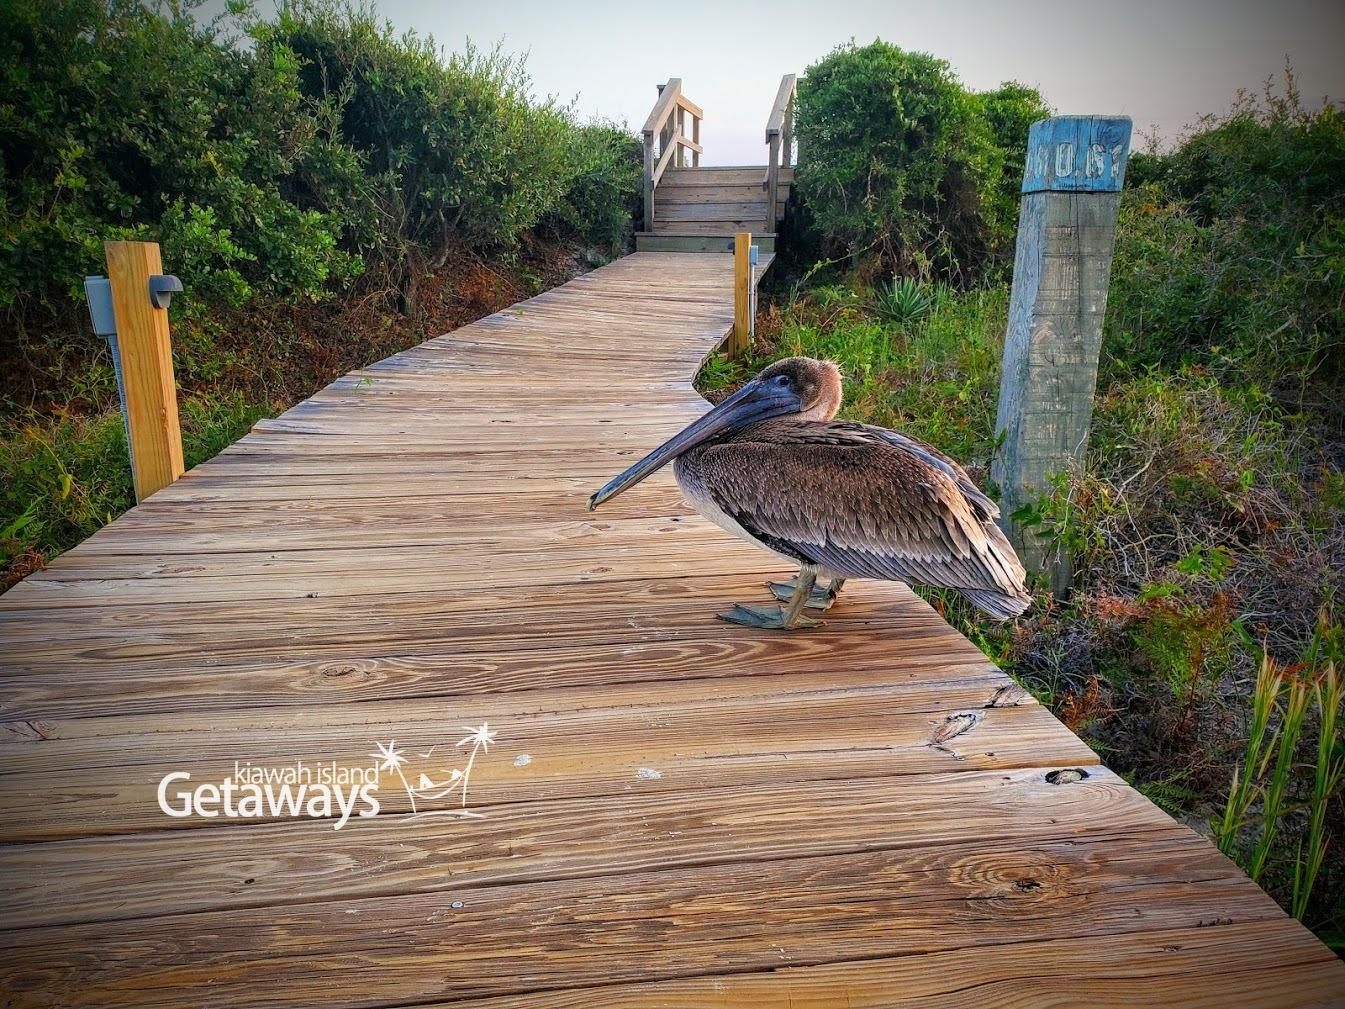 Boardwalk to the Beach - 7-minute walk